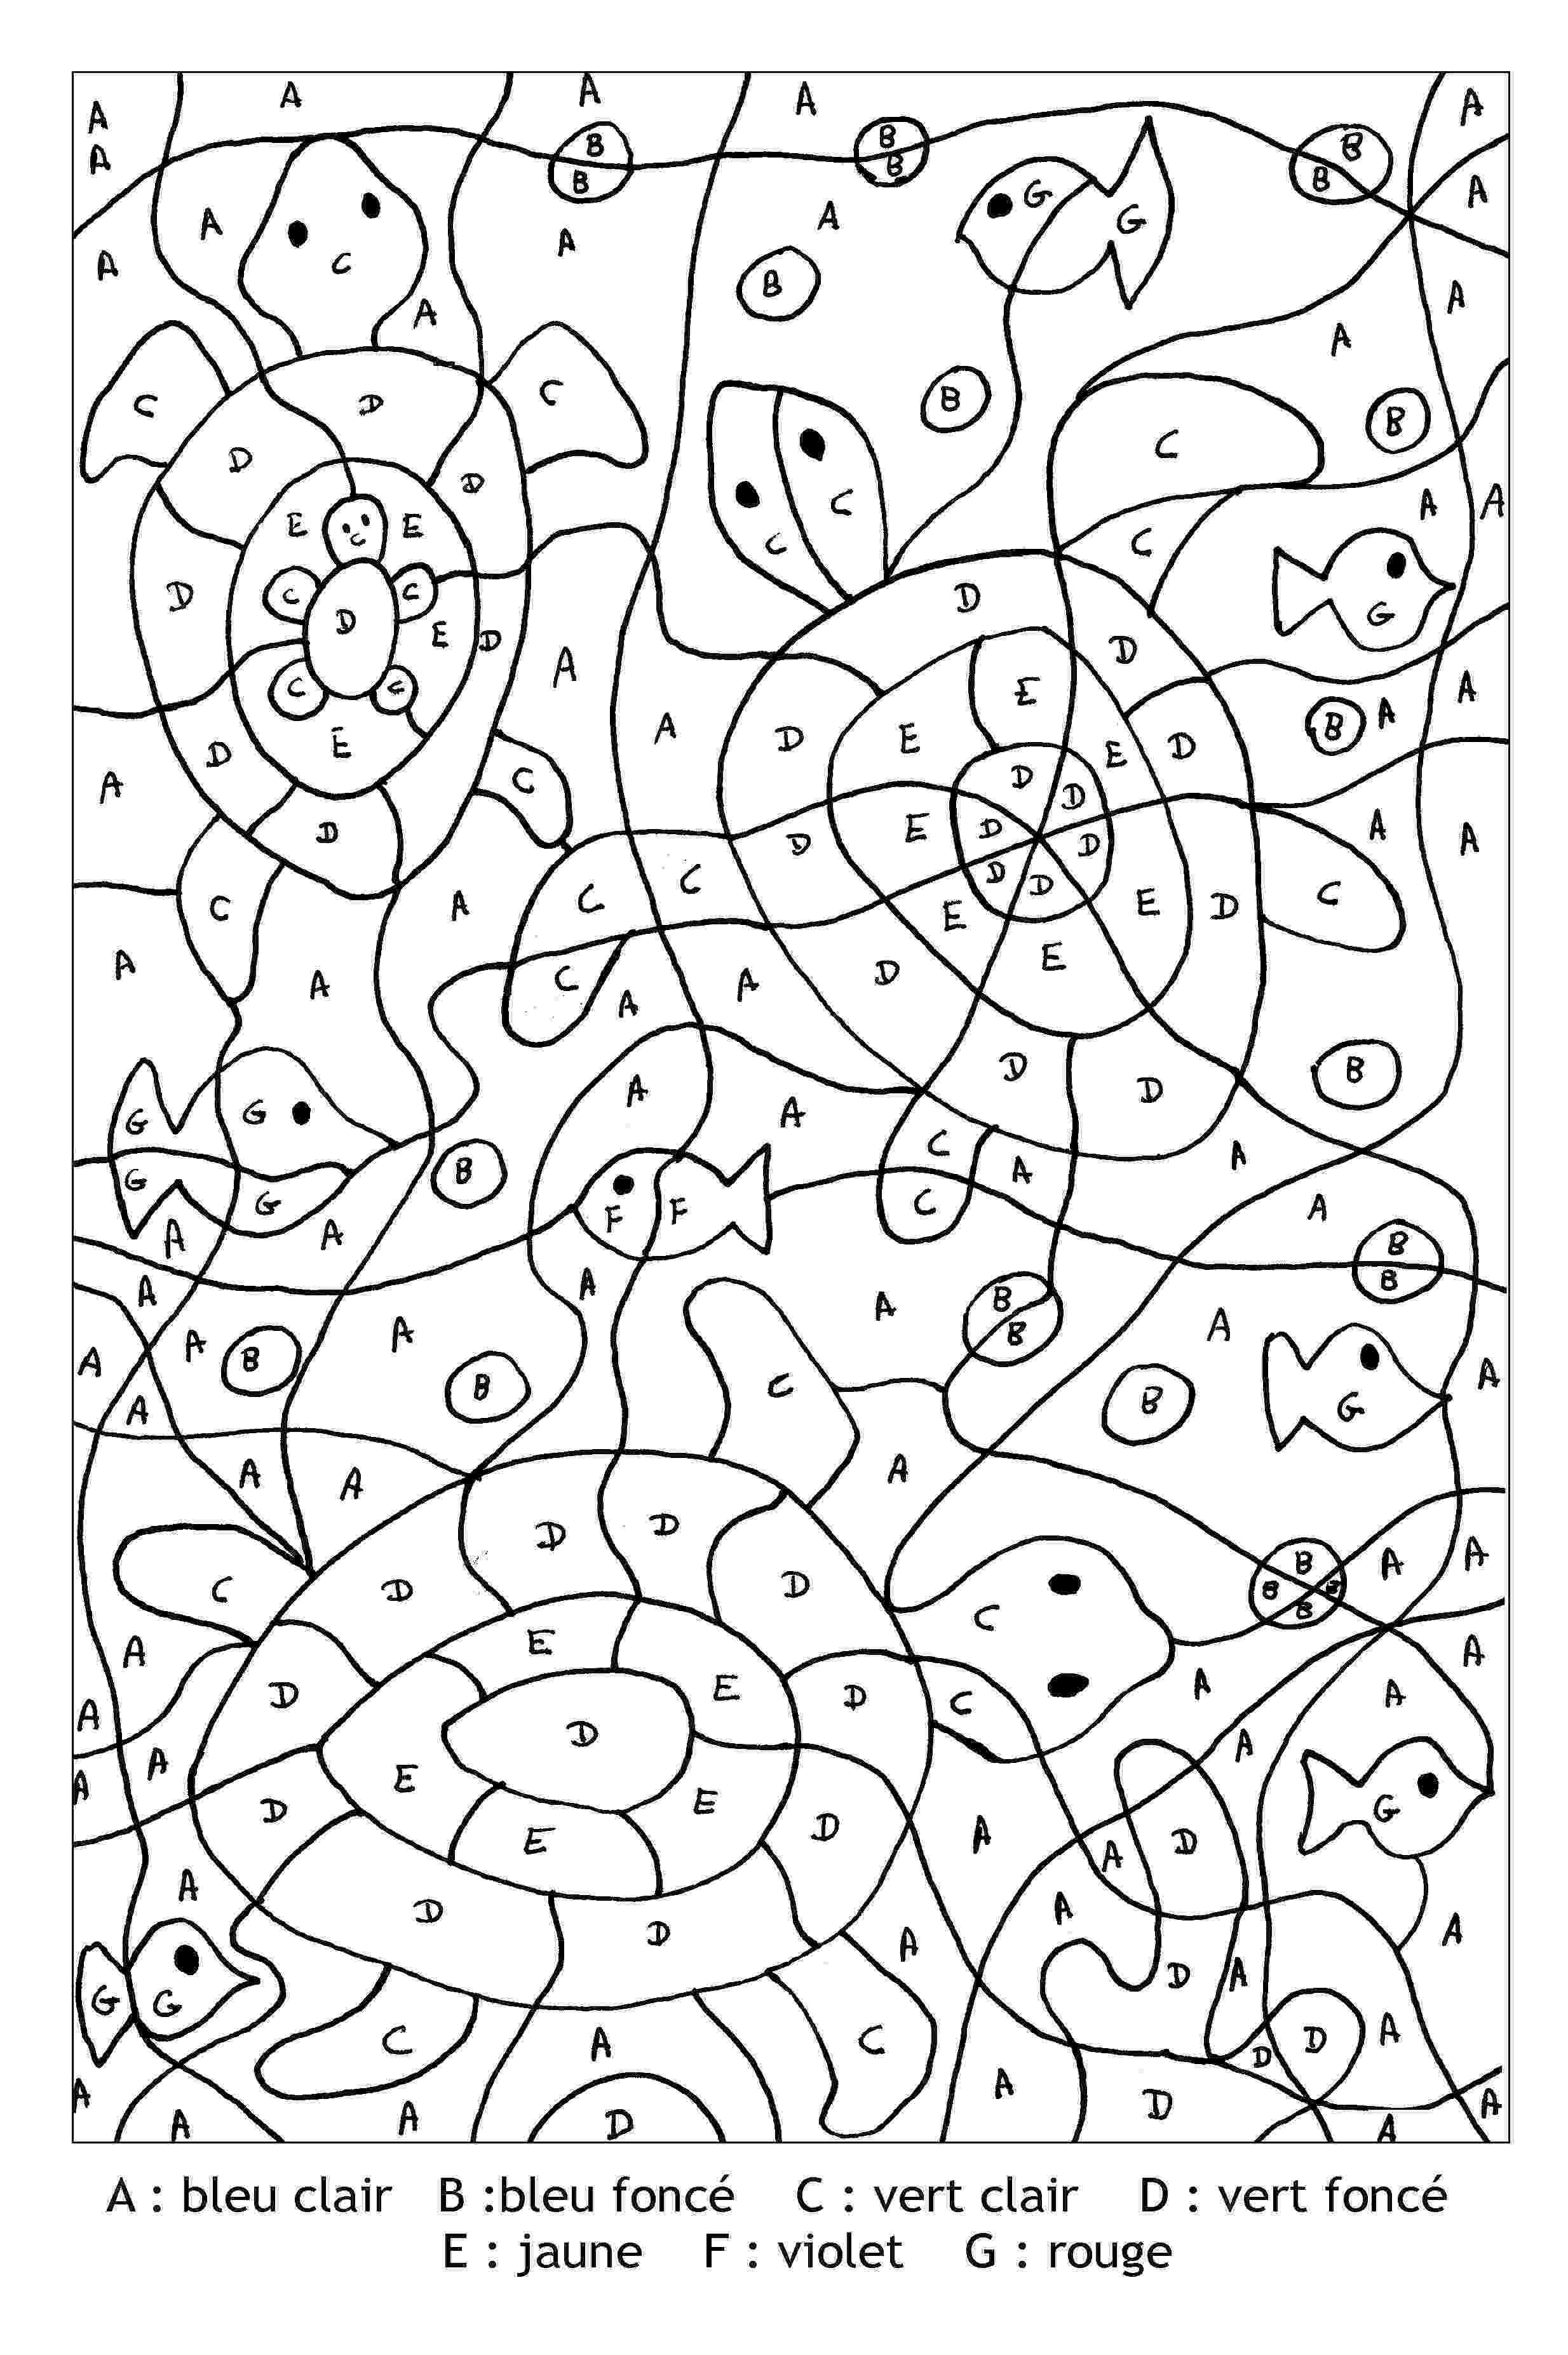 magic coloring sheets ravnica mtg coloring download ravnica mtg coloring sheets magic coloring